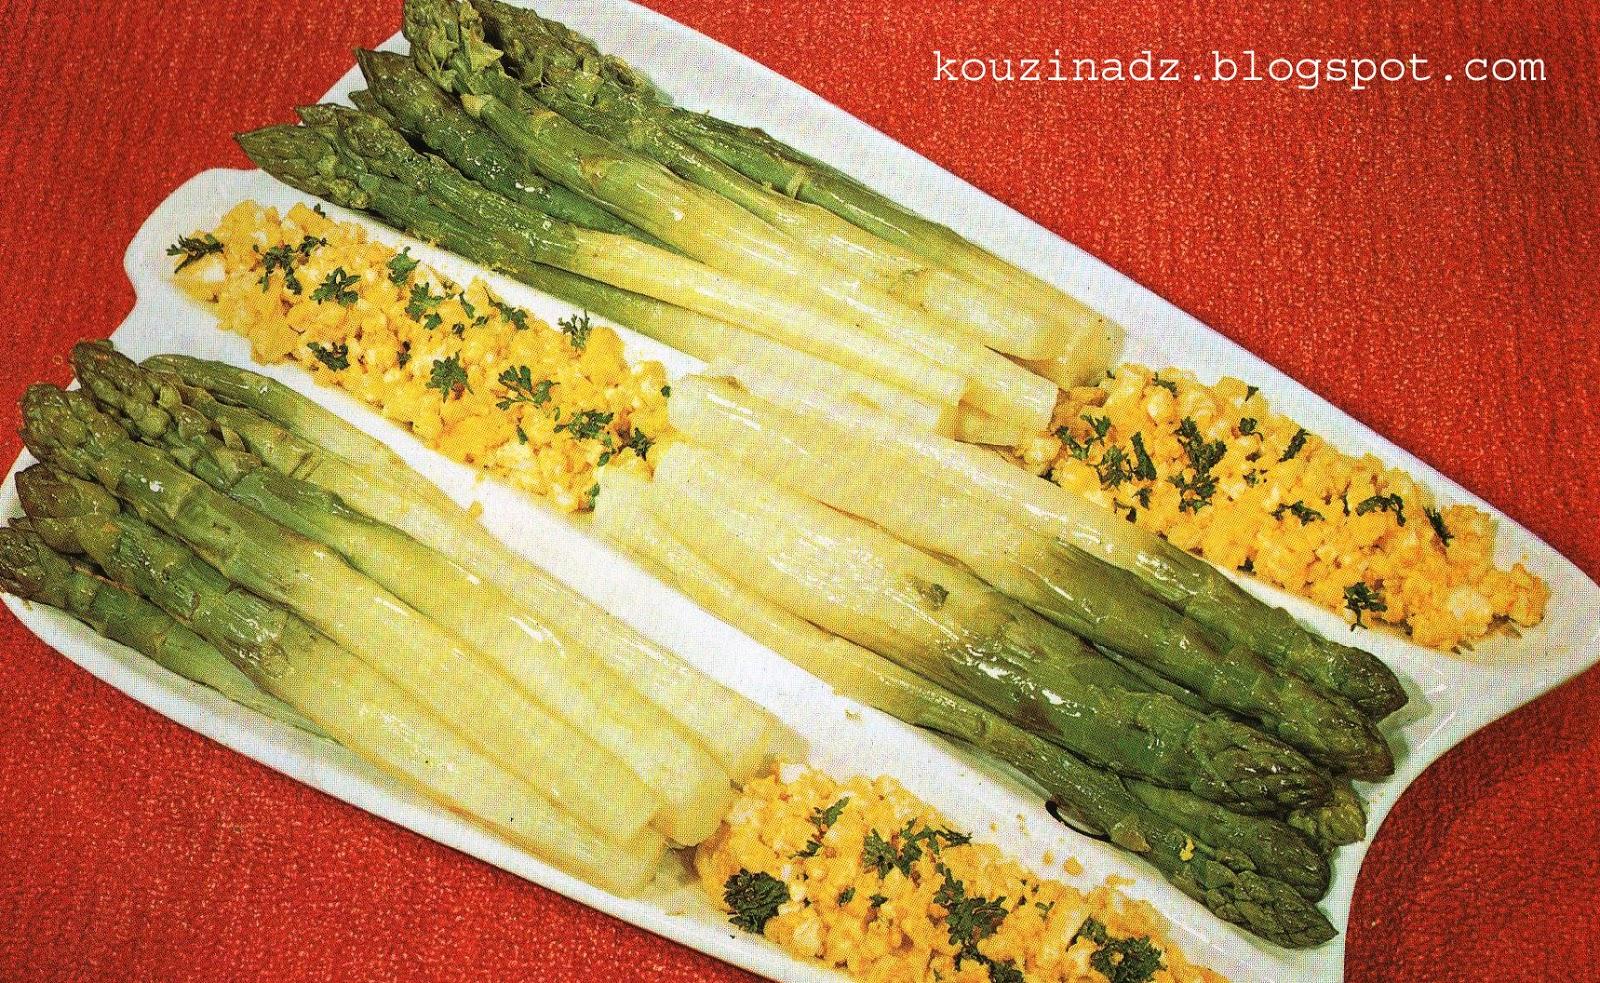 La cuisine alg rienne mars 2013 - La cuisine algerienne samira ...